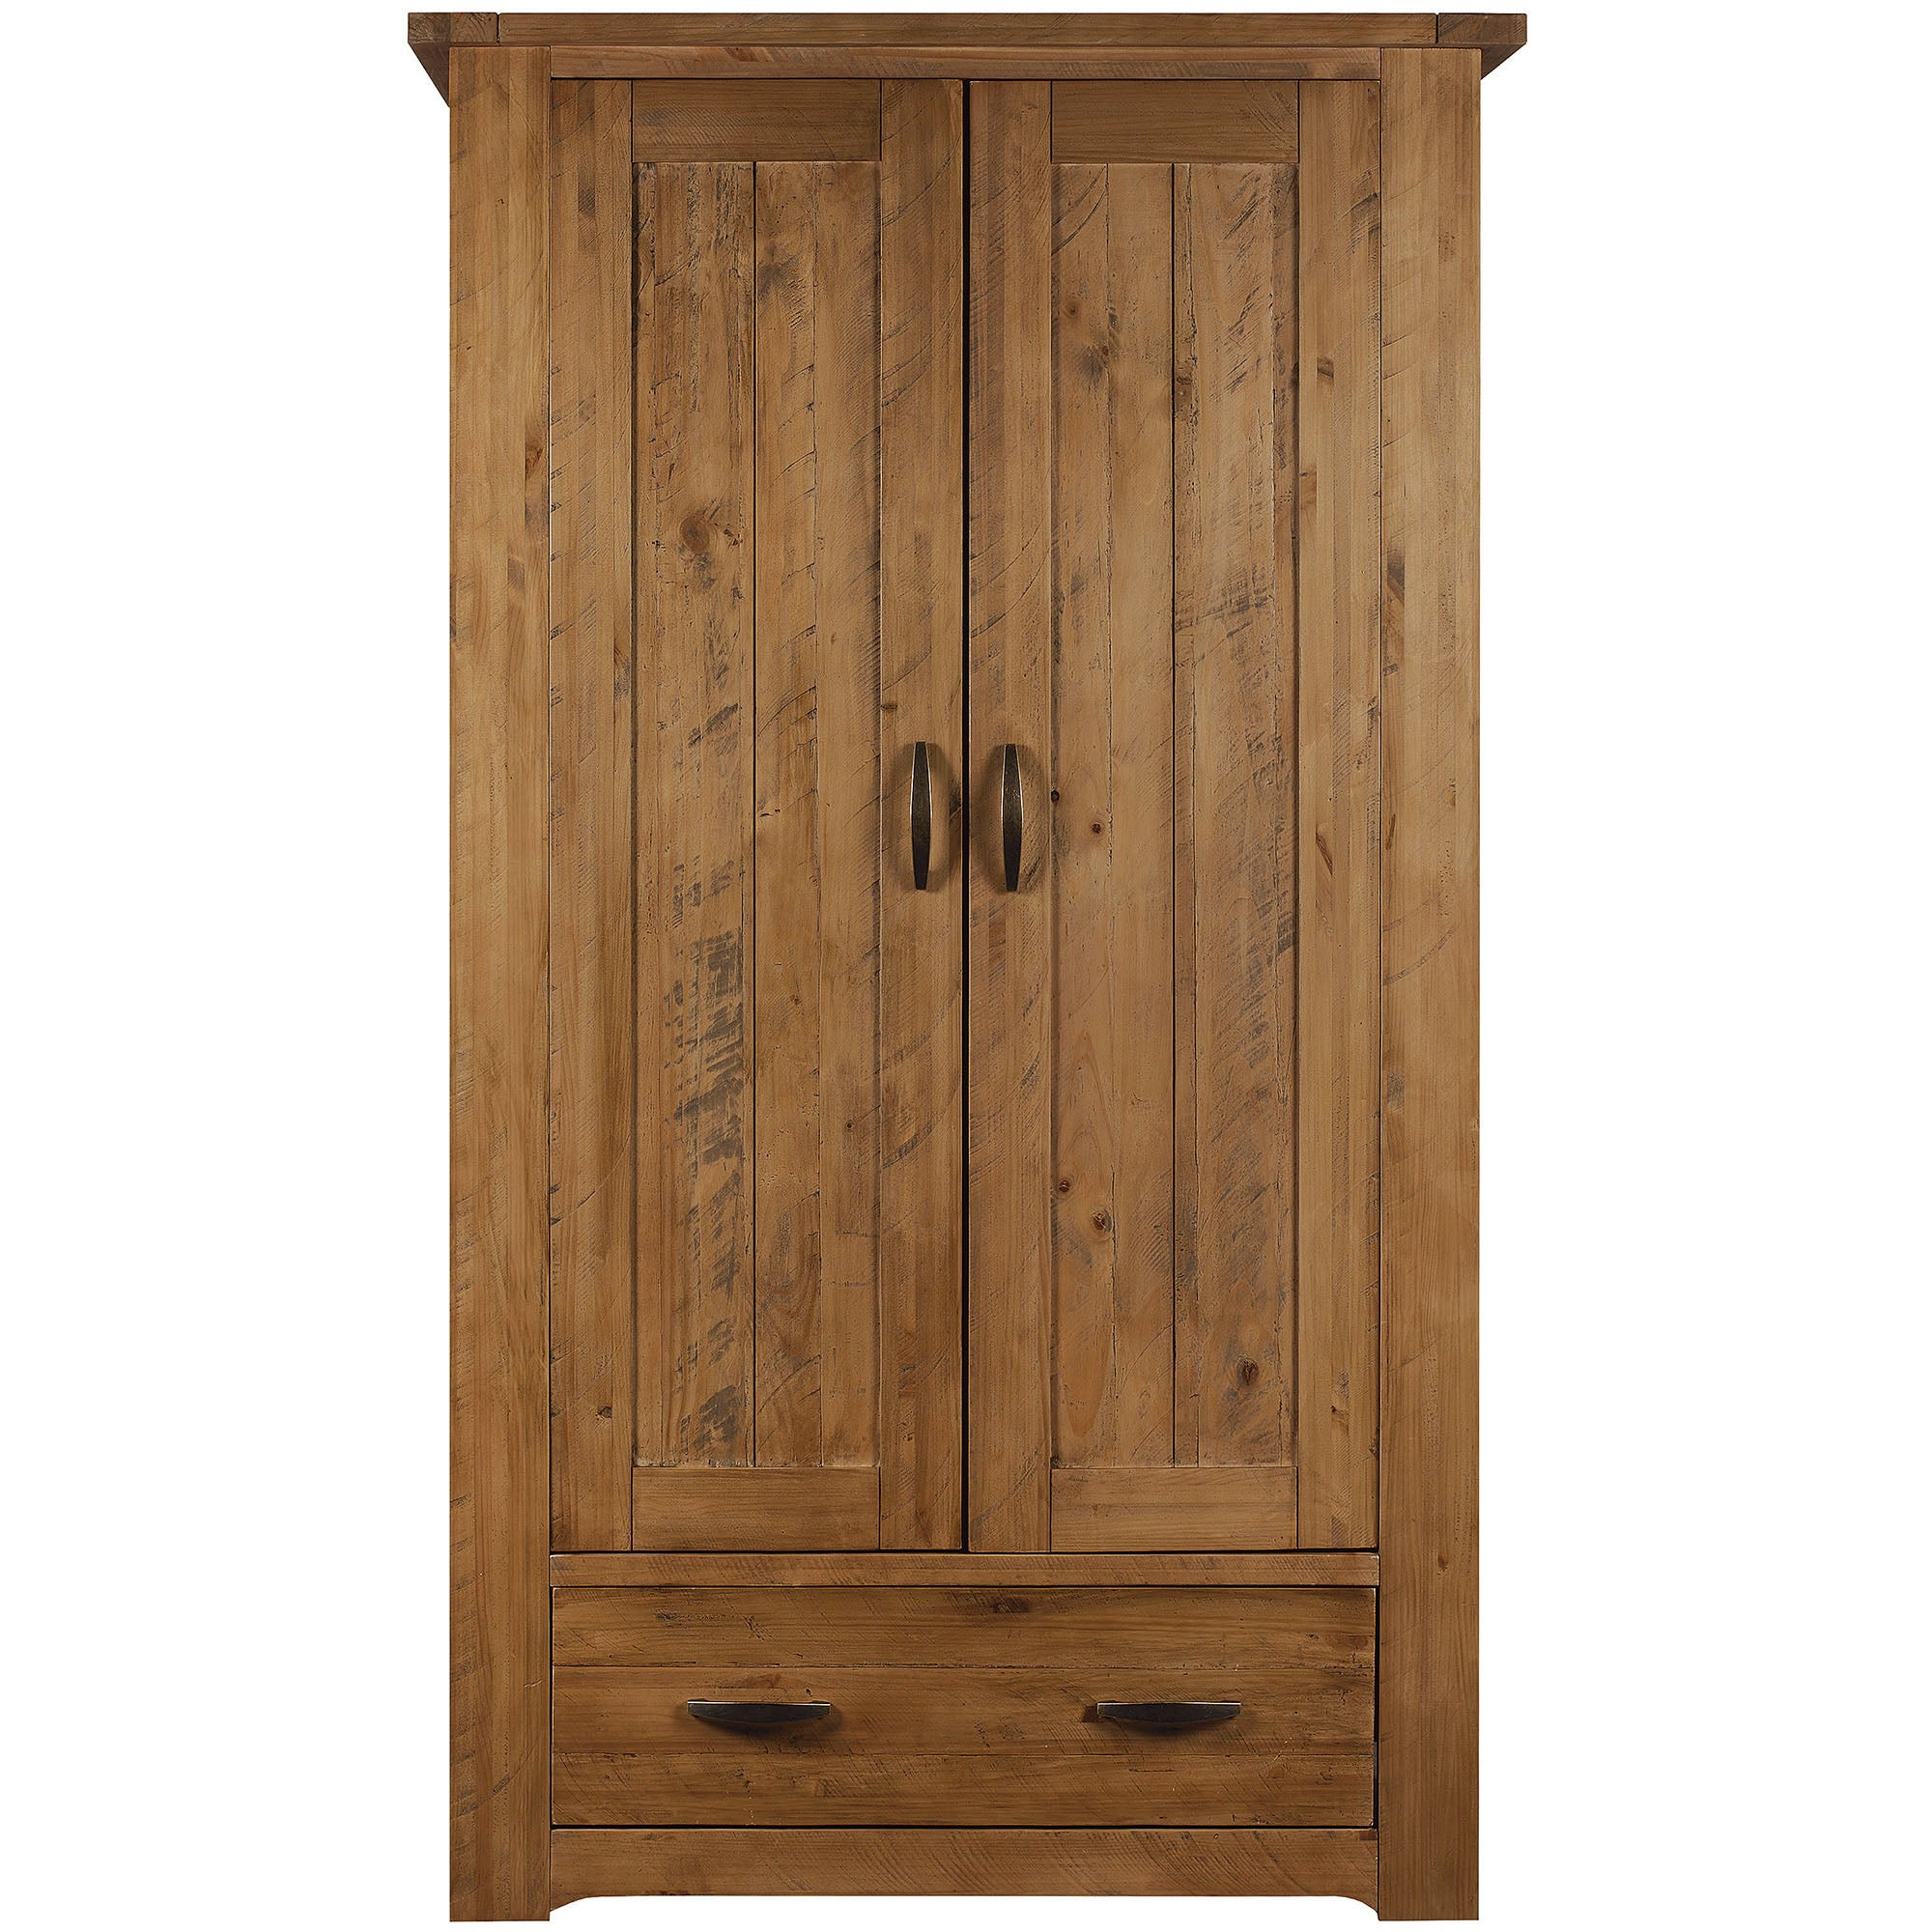 Loxley Pine Wardrobe